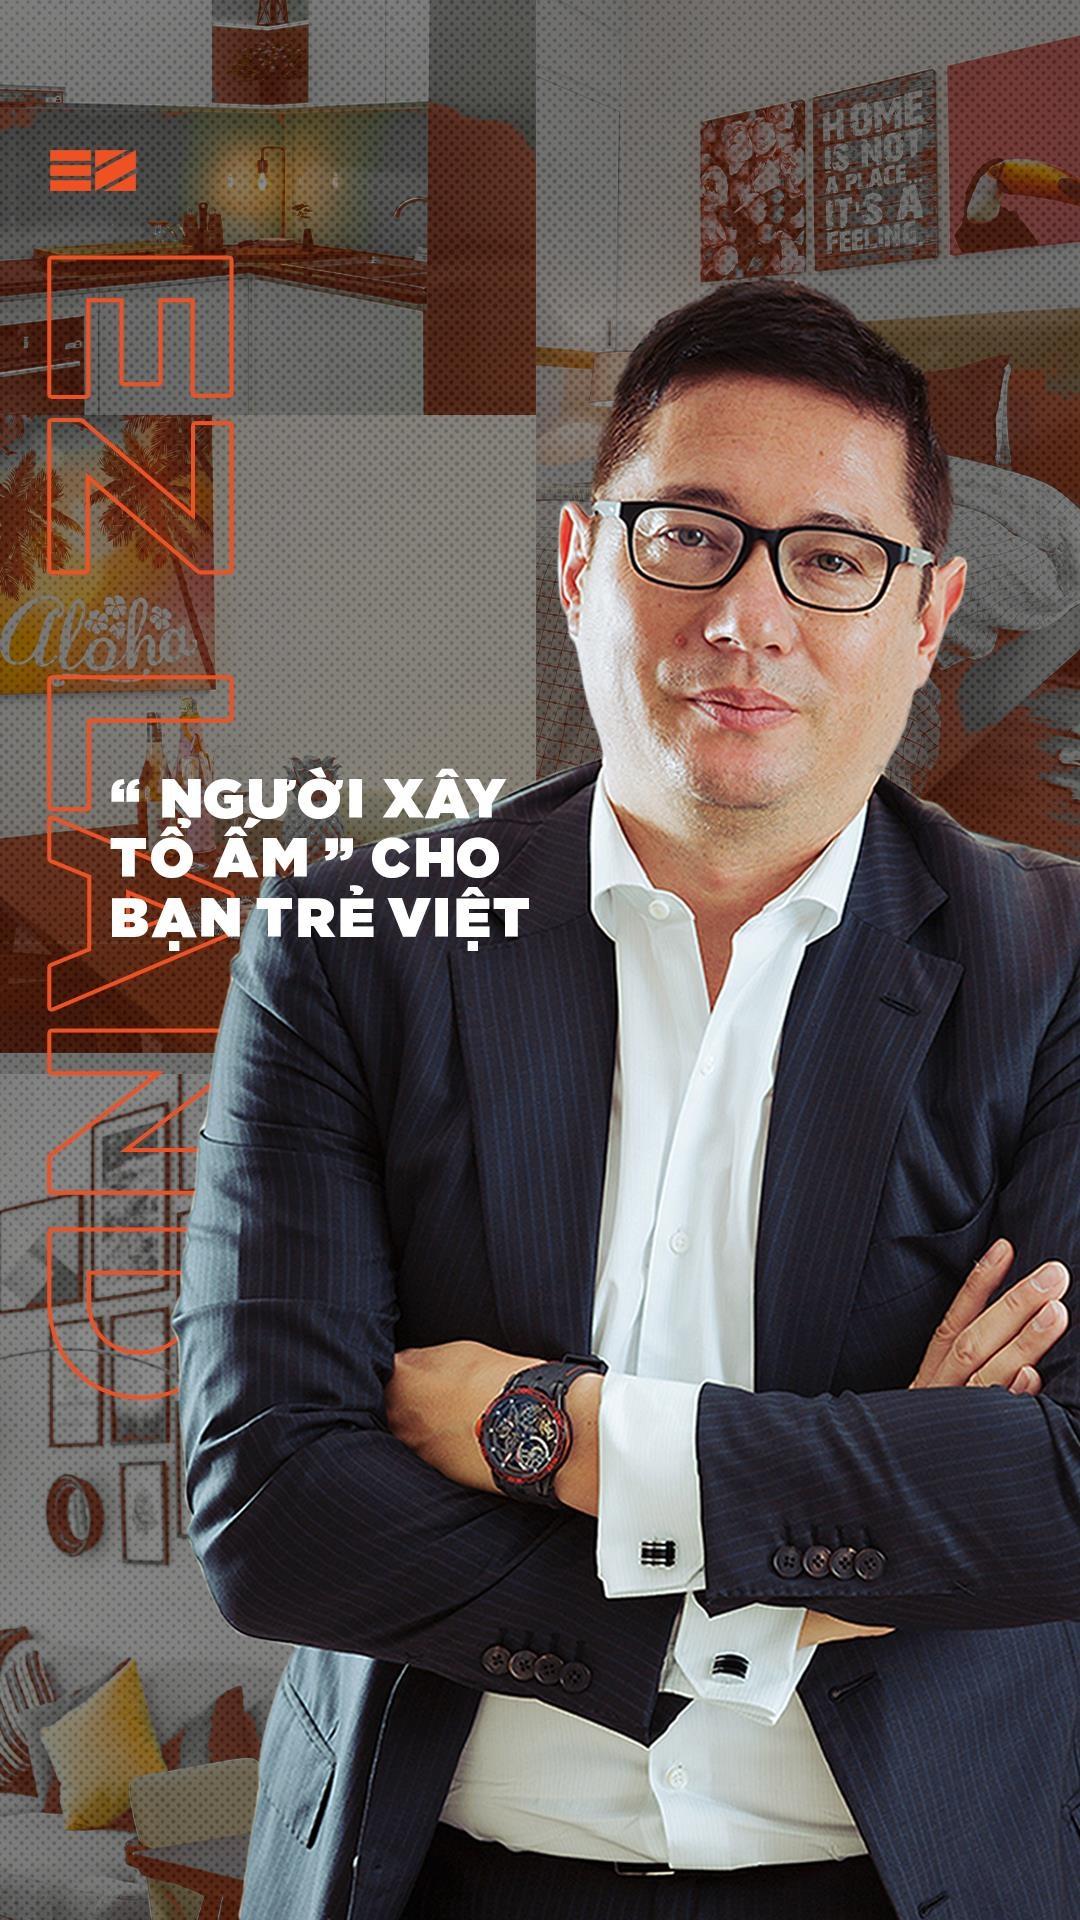 EZ Land: 'Nguoi xay to am' cho ban tre Viet hinh anh 1